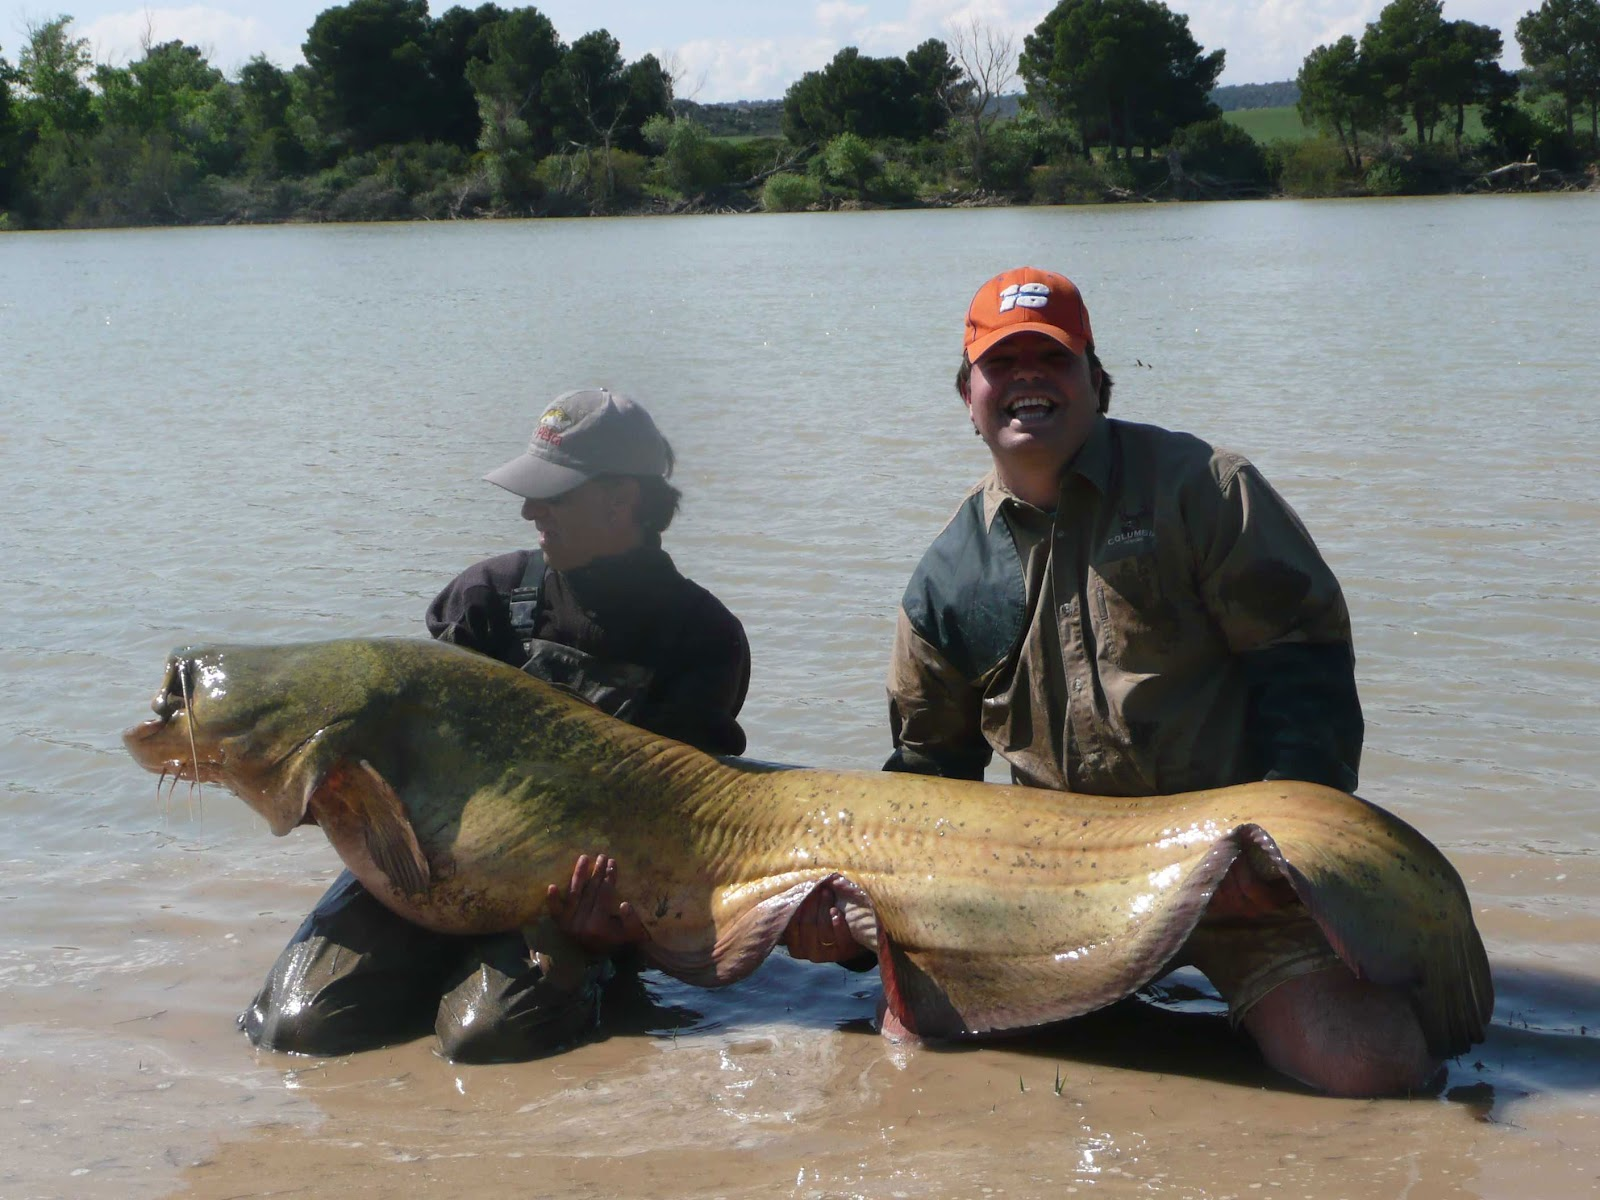 Catfish fishing guide in the river ebro catfishing and for Catfish fishing gear